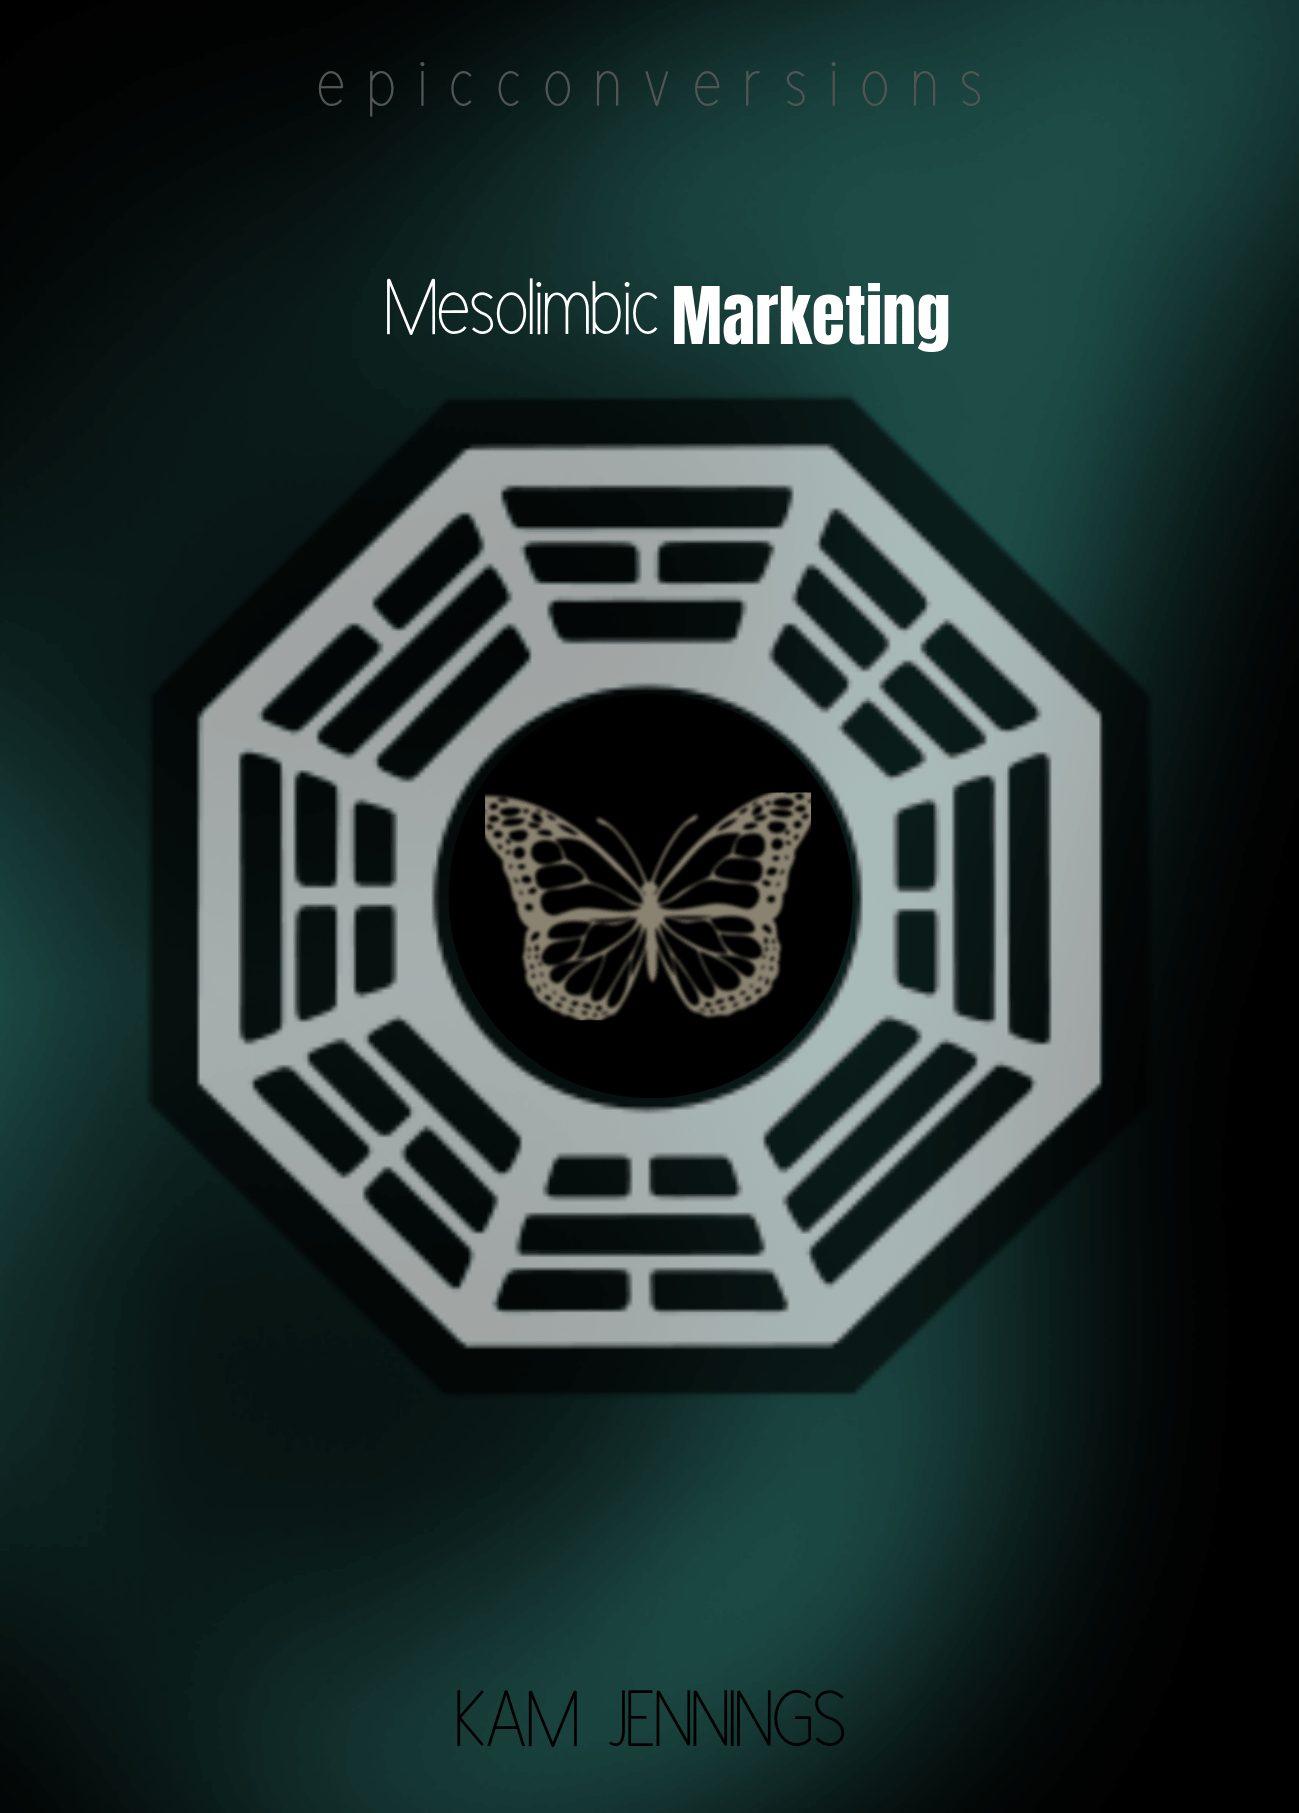 Mesolimbic Marketing Review